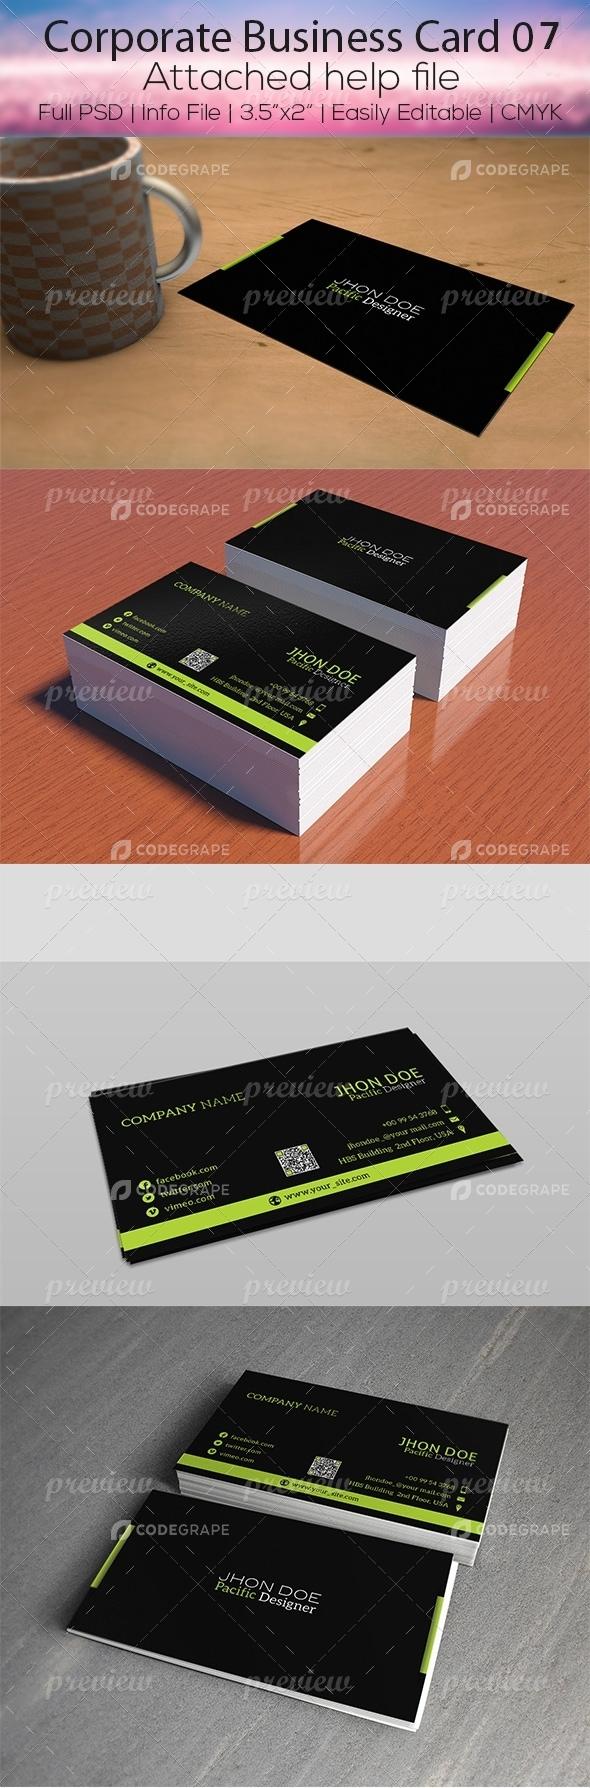 Corporate Business Card 07